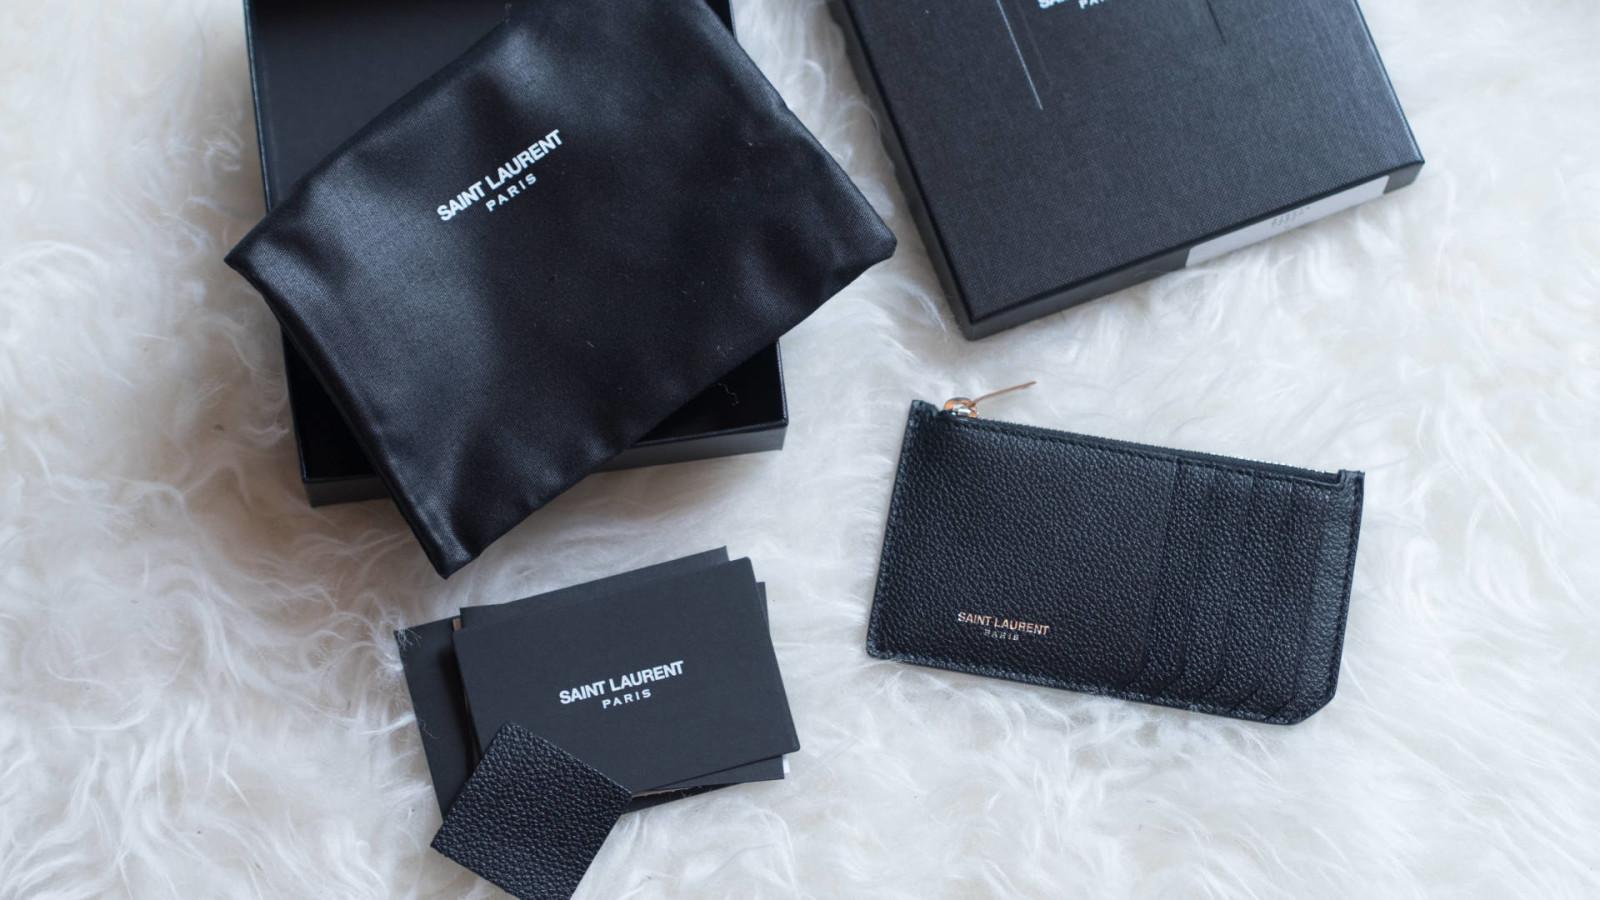 Saint Laurent grained leather zip cardholder, luisaviaroma